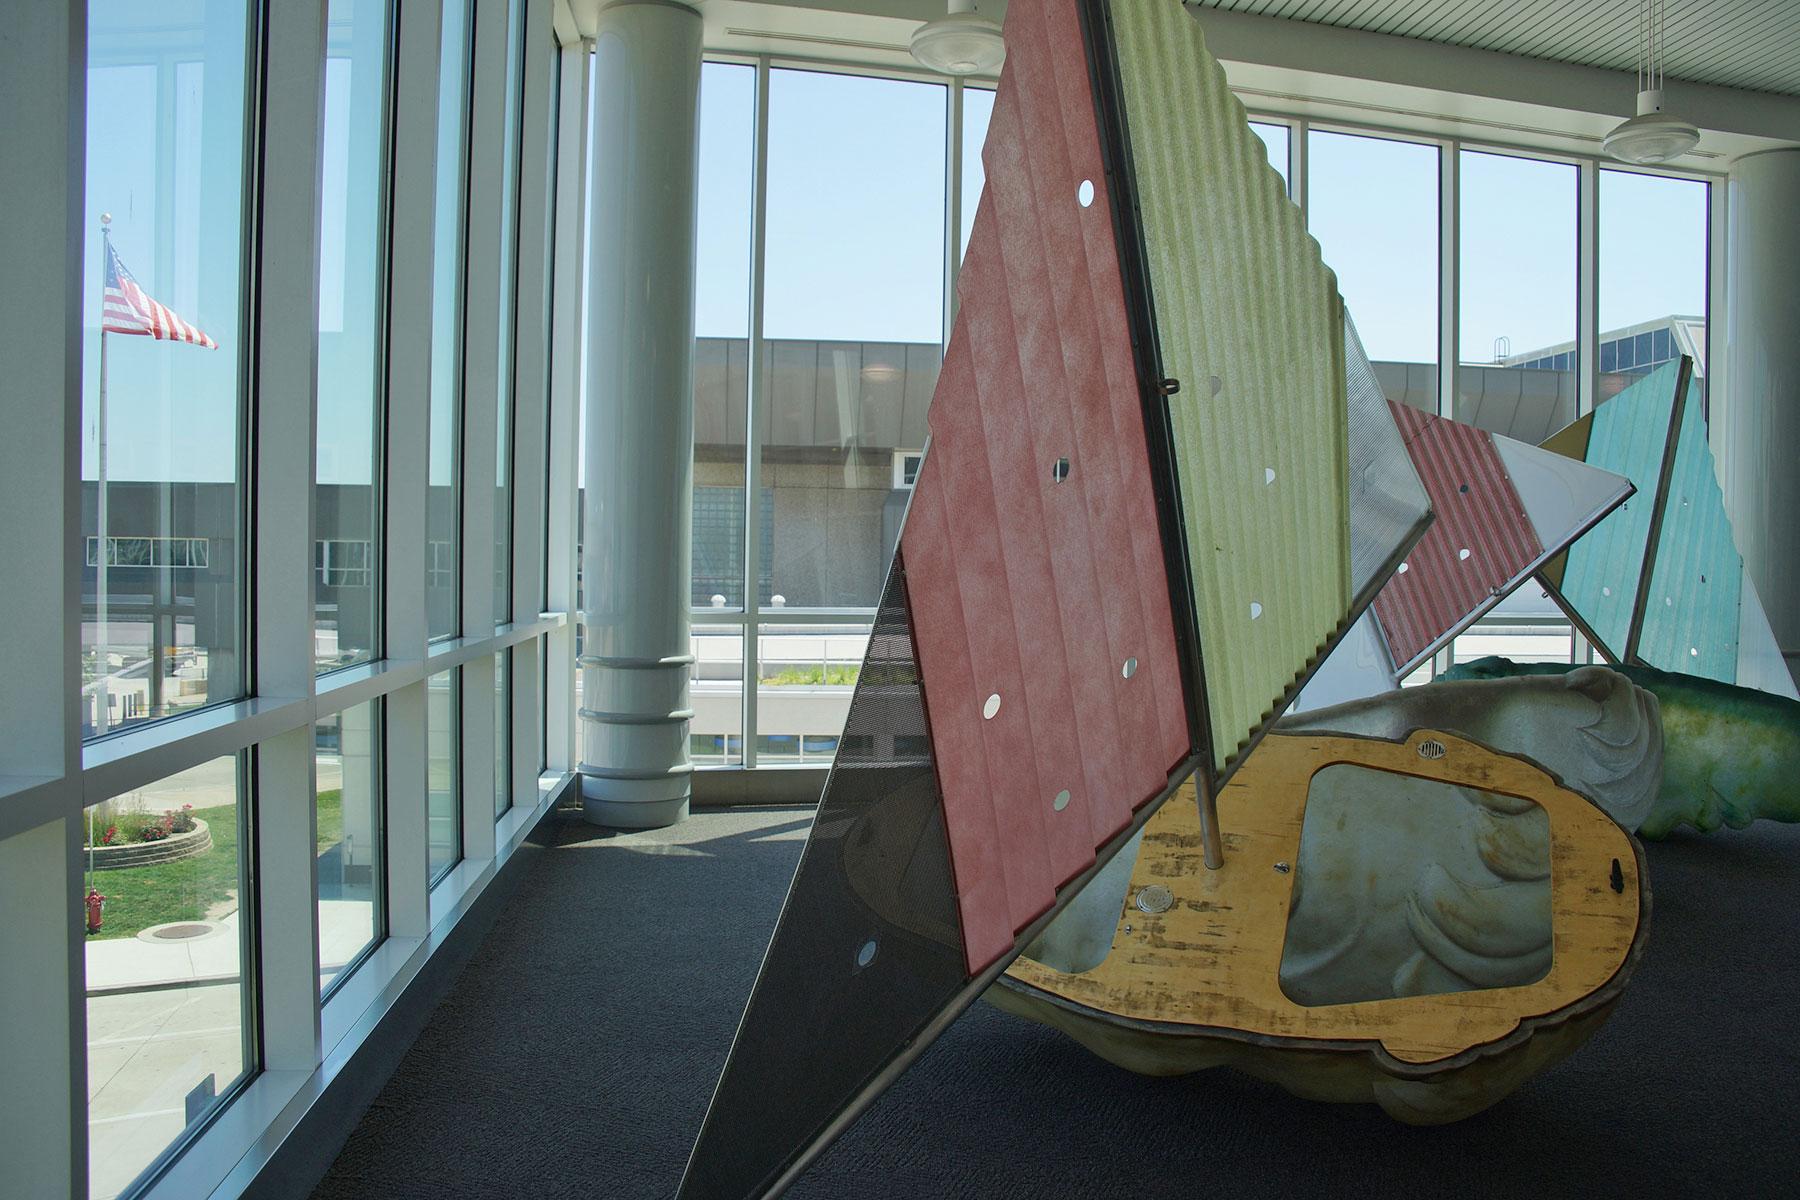 071917_airportmeditationroom_04